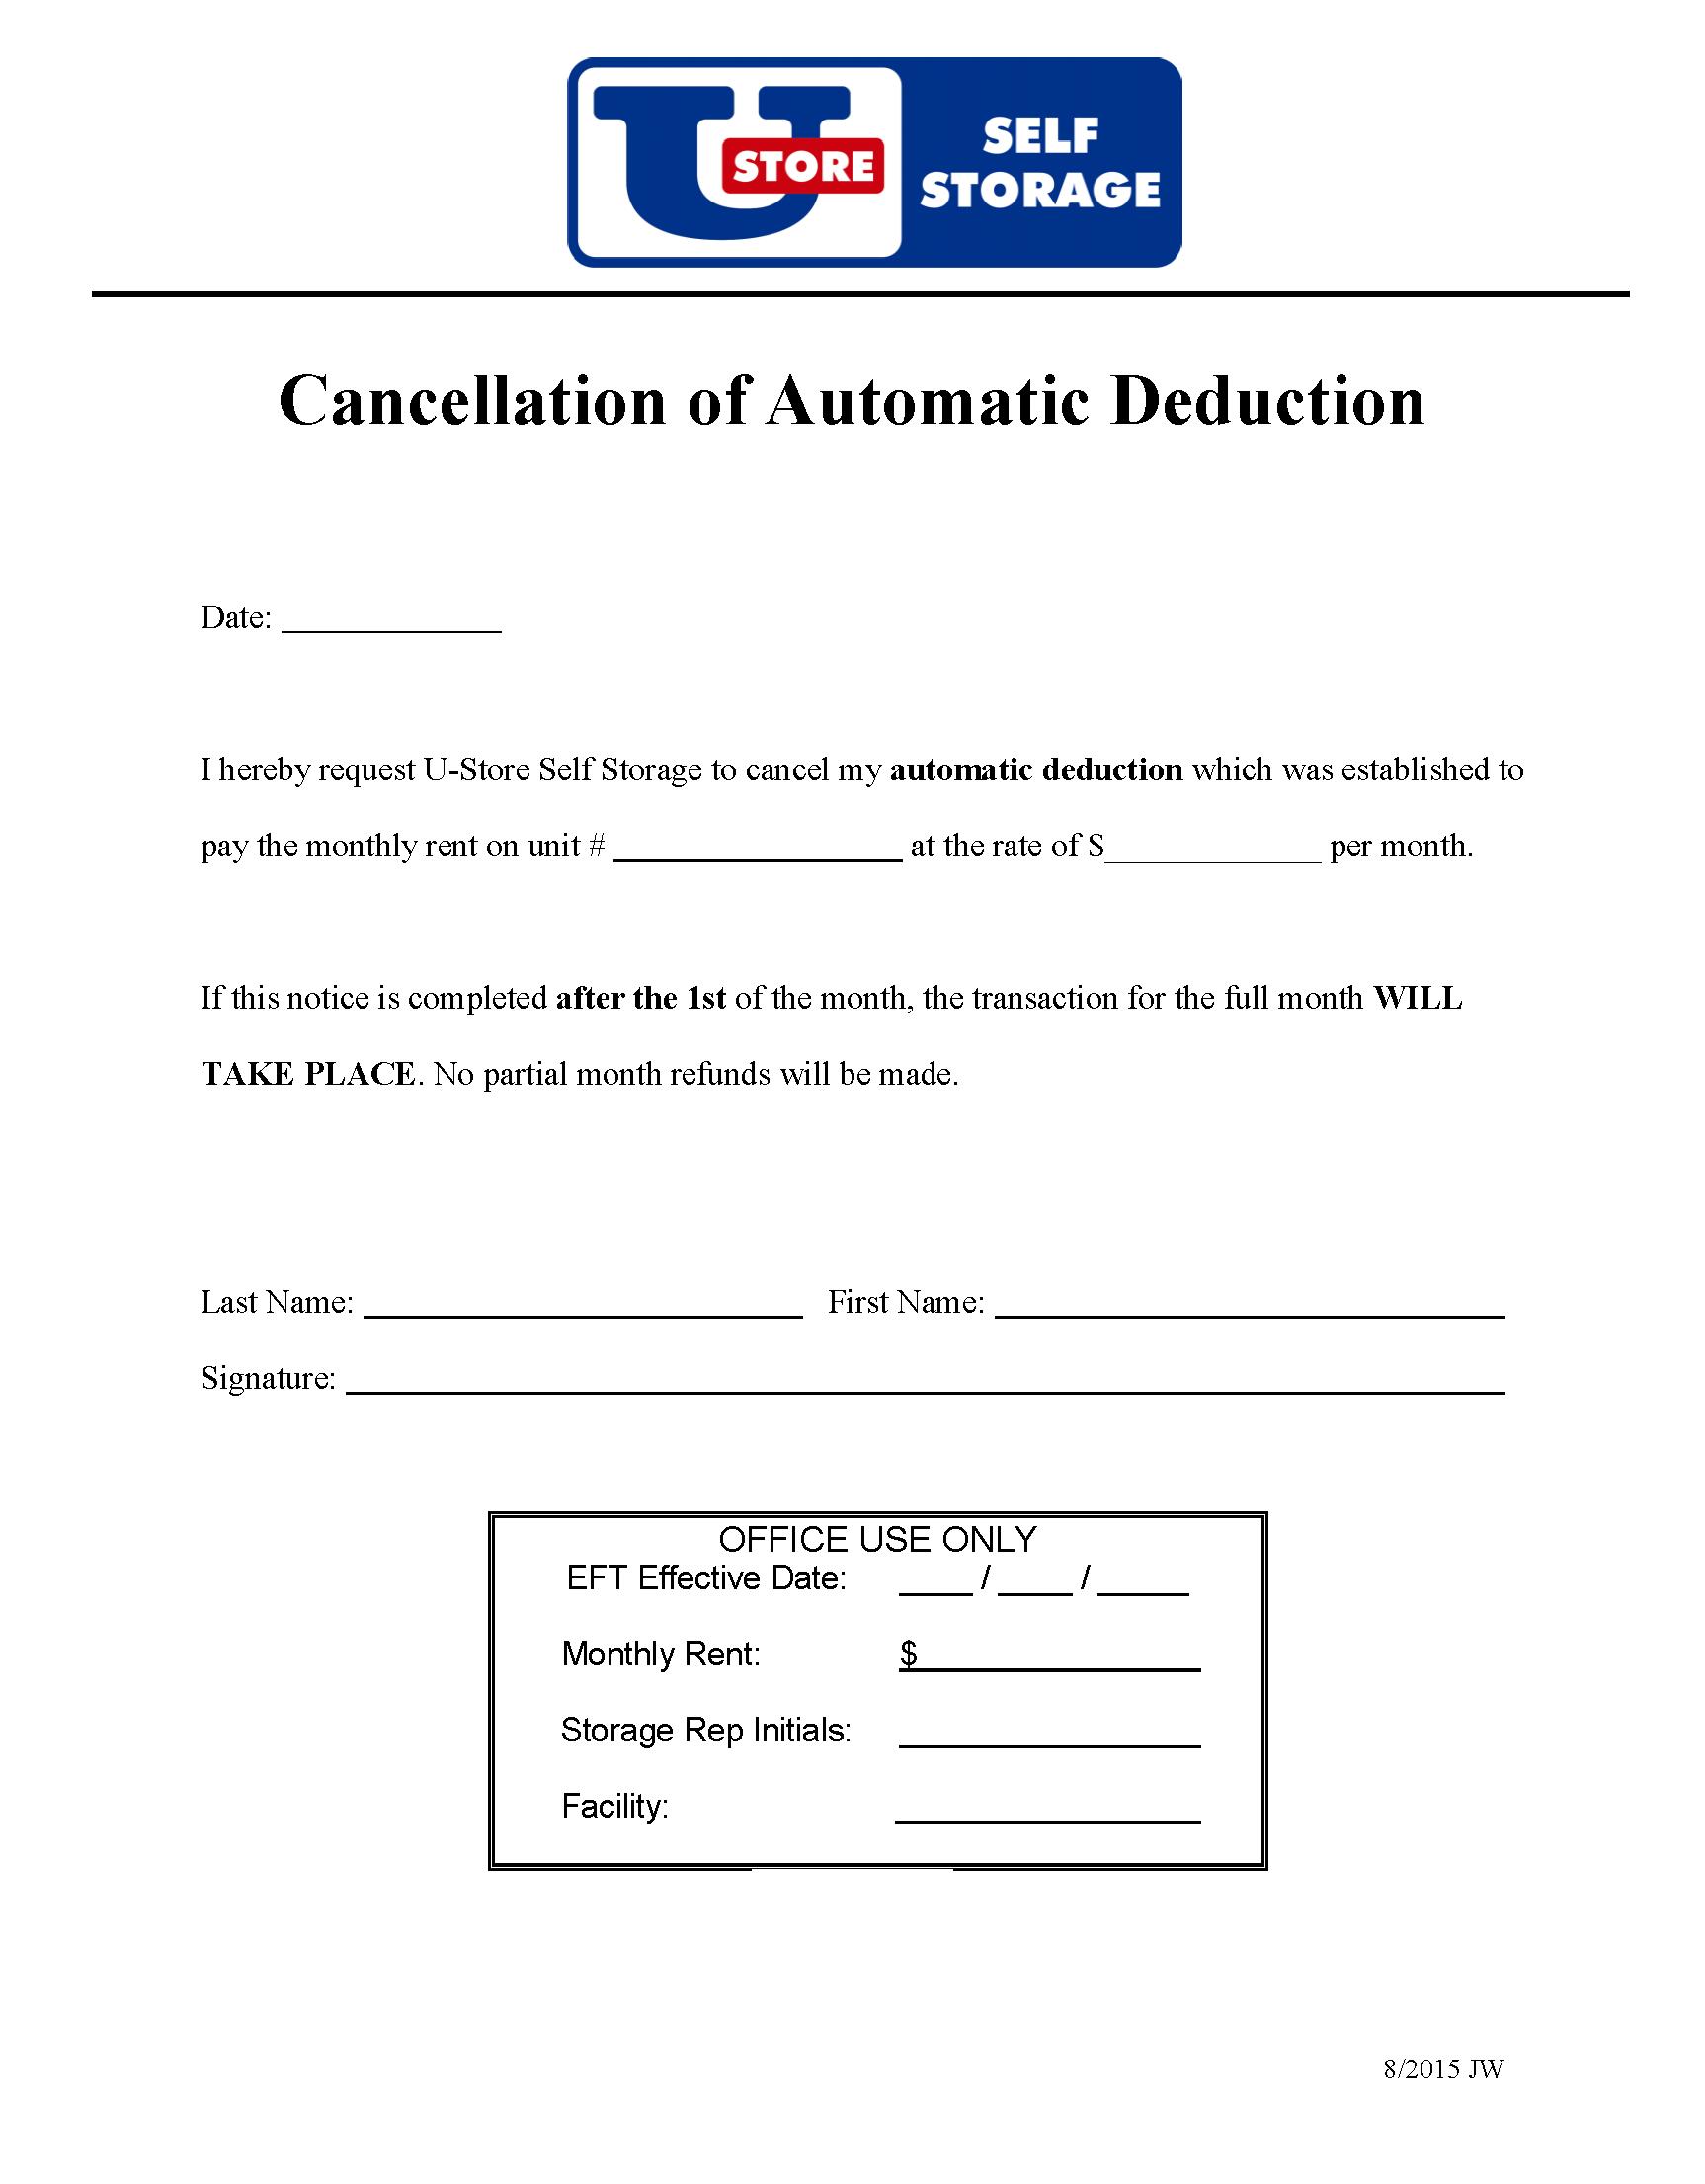 U-Store - Cancel Auto